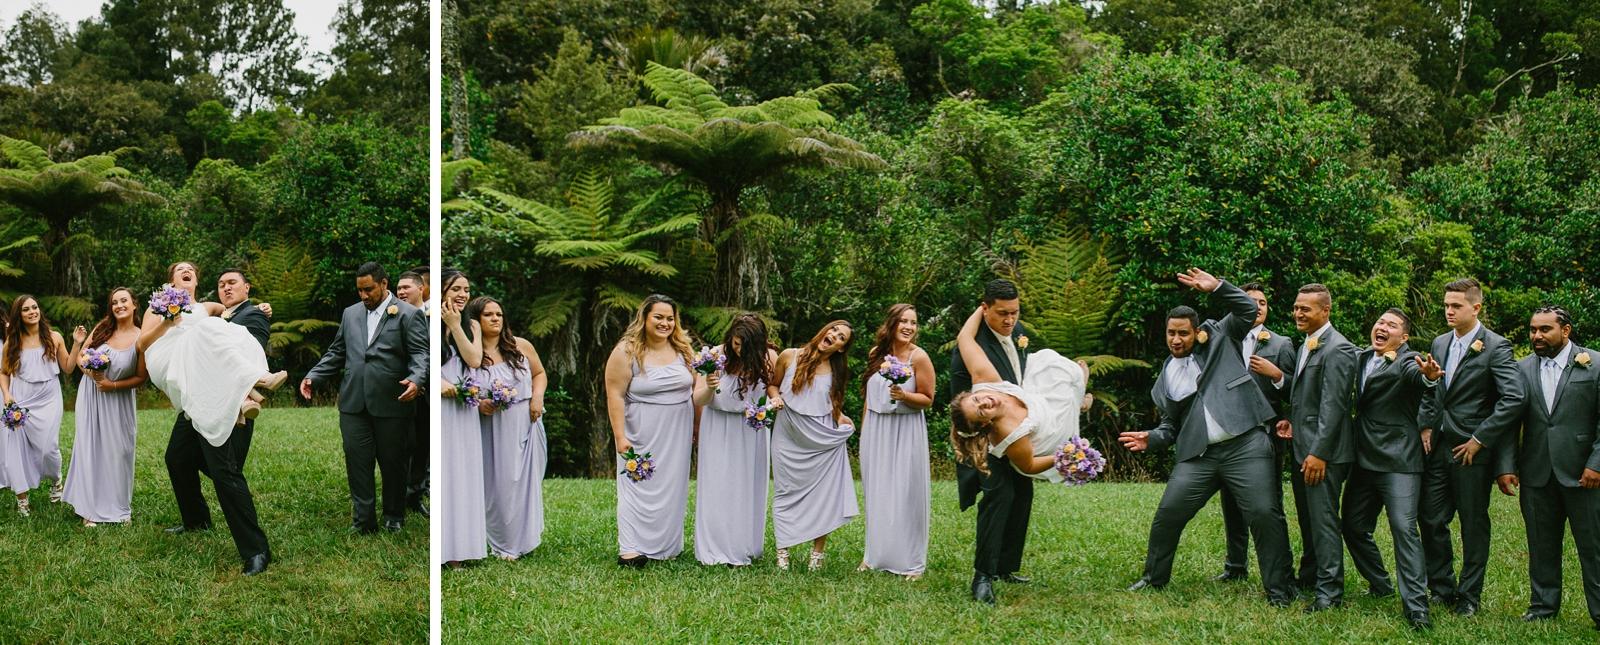 GabbyFiti_Auckland Wedding Photographer_Patty Lagera_0049.jpg